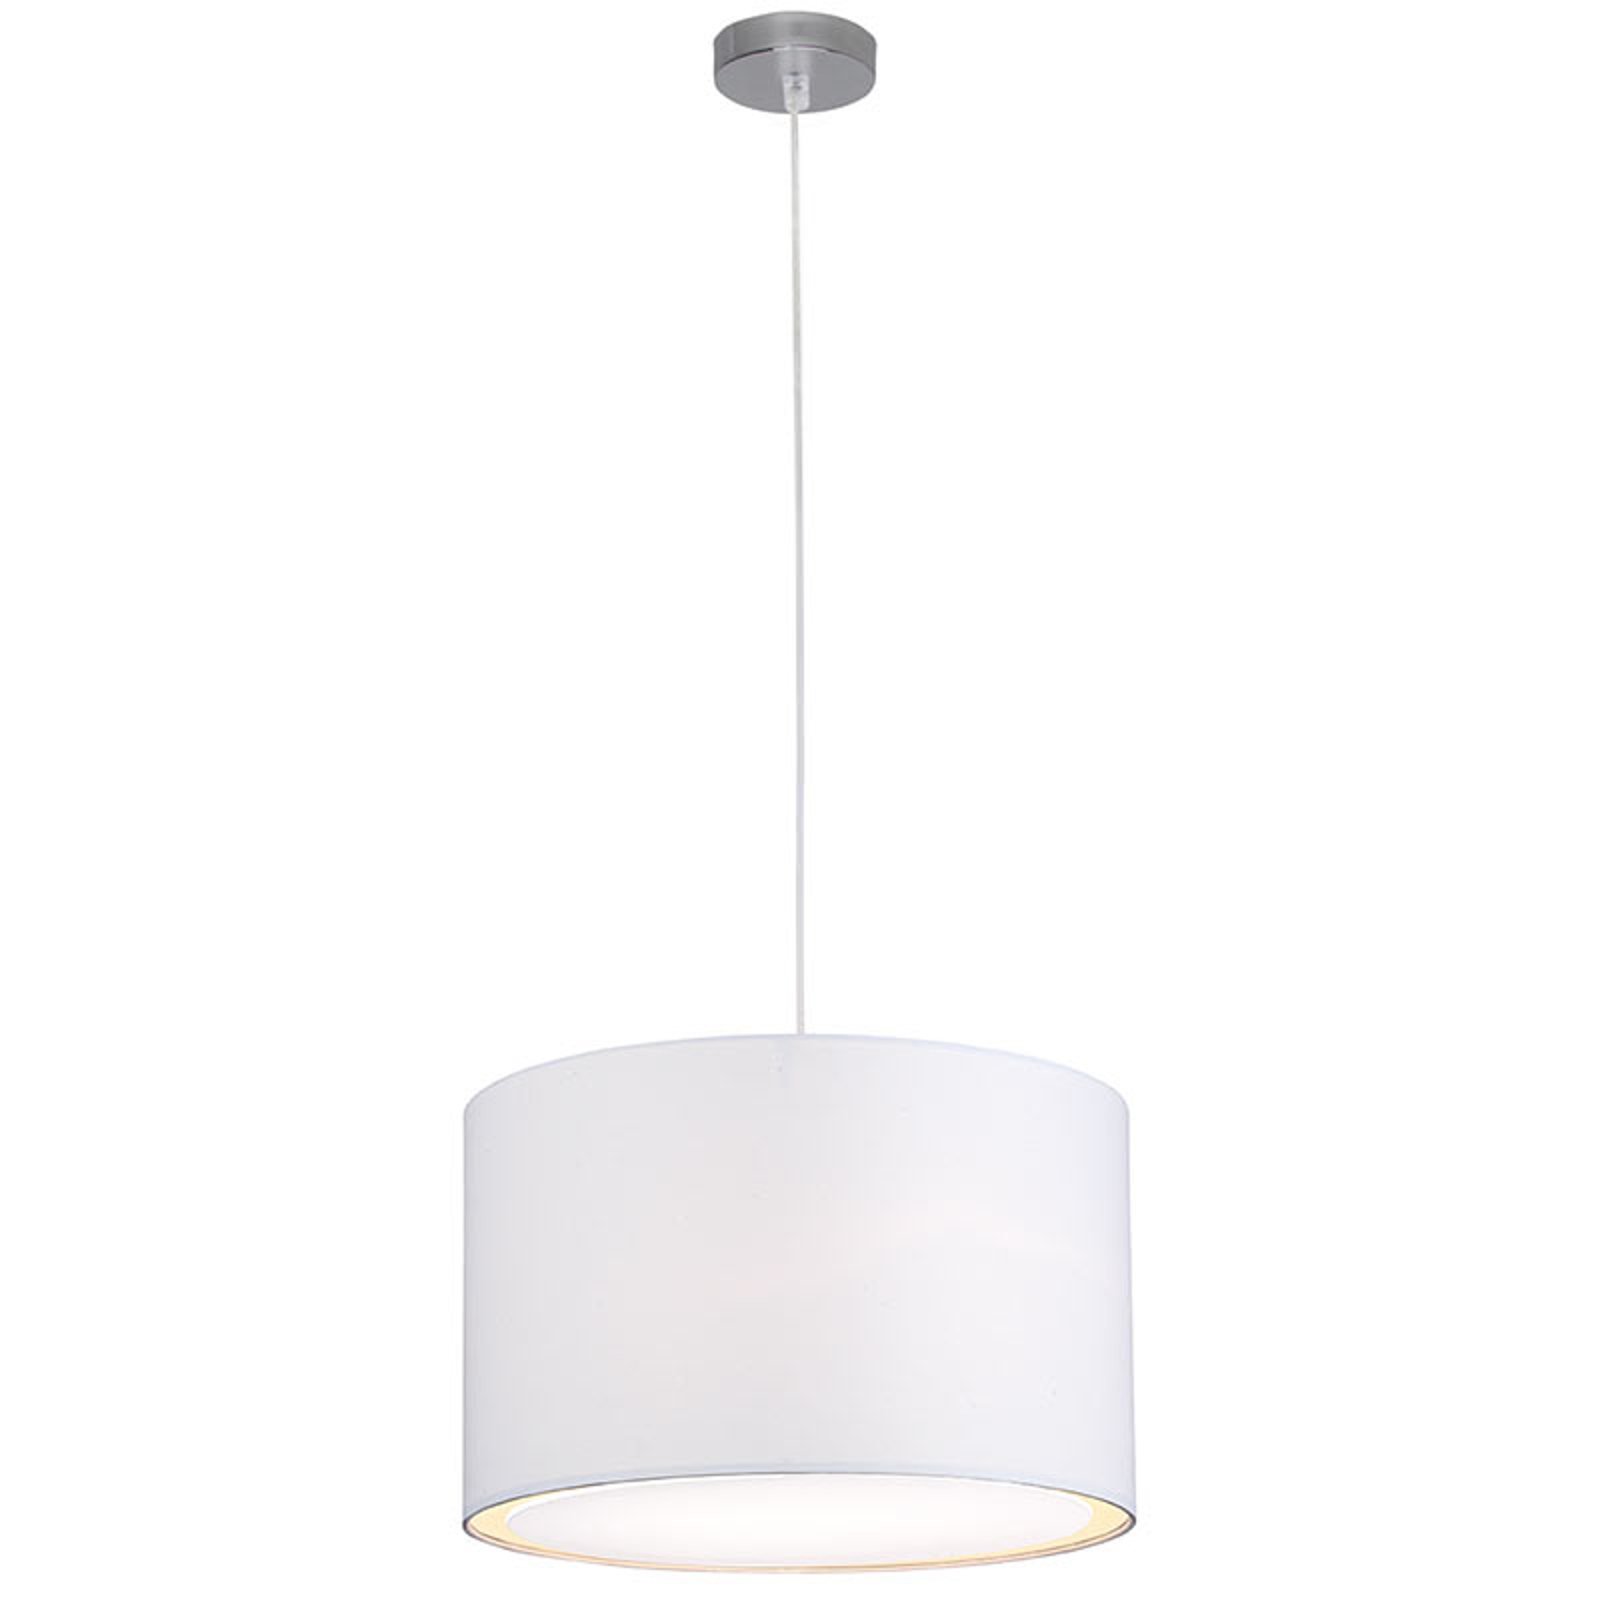 Lámpara colgante Clarie, clásico-moderno, blanco